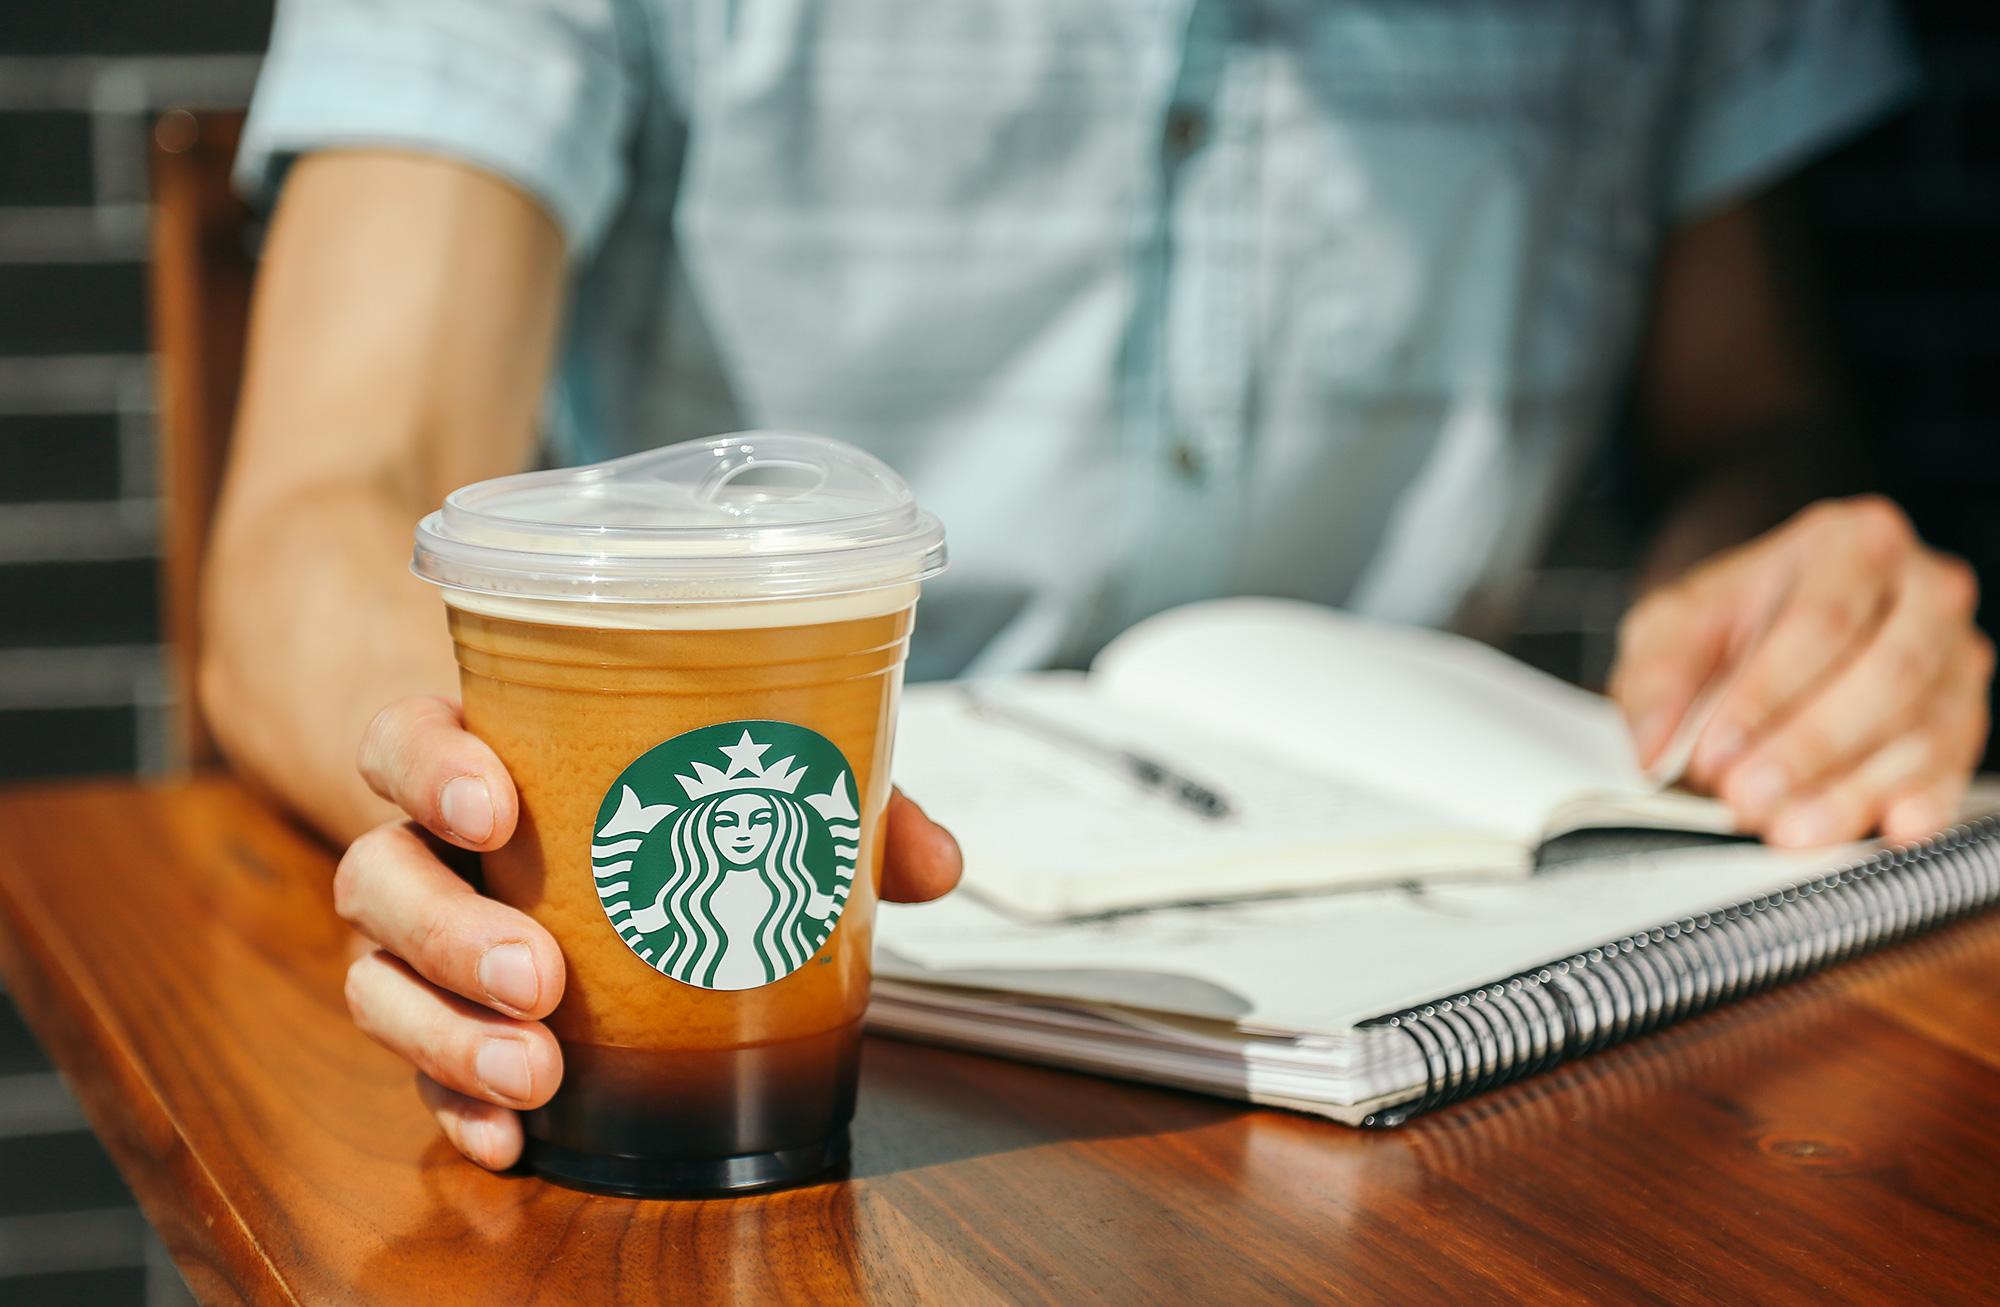 BIG Starbucks News!